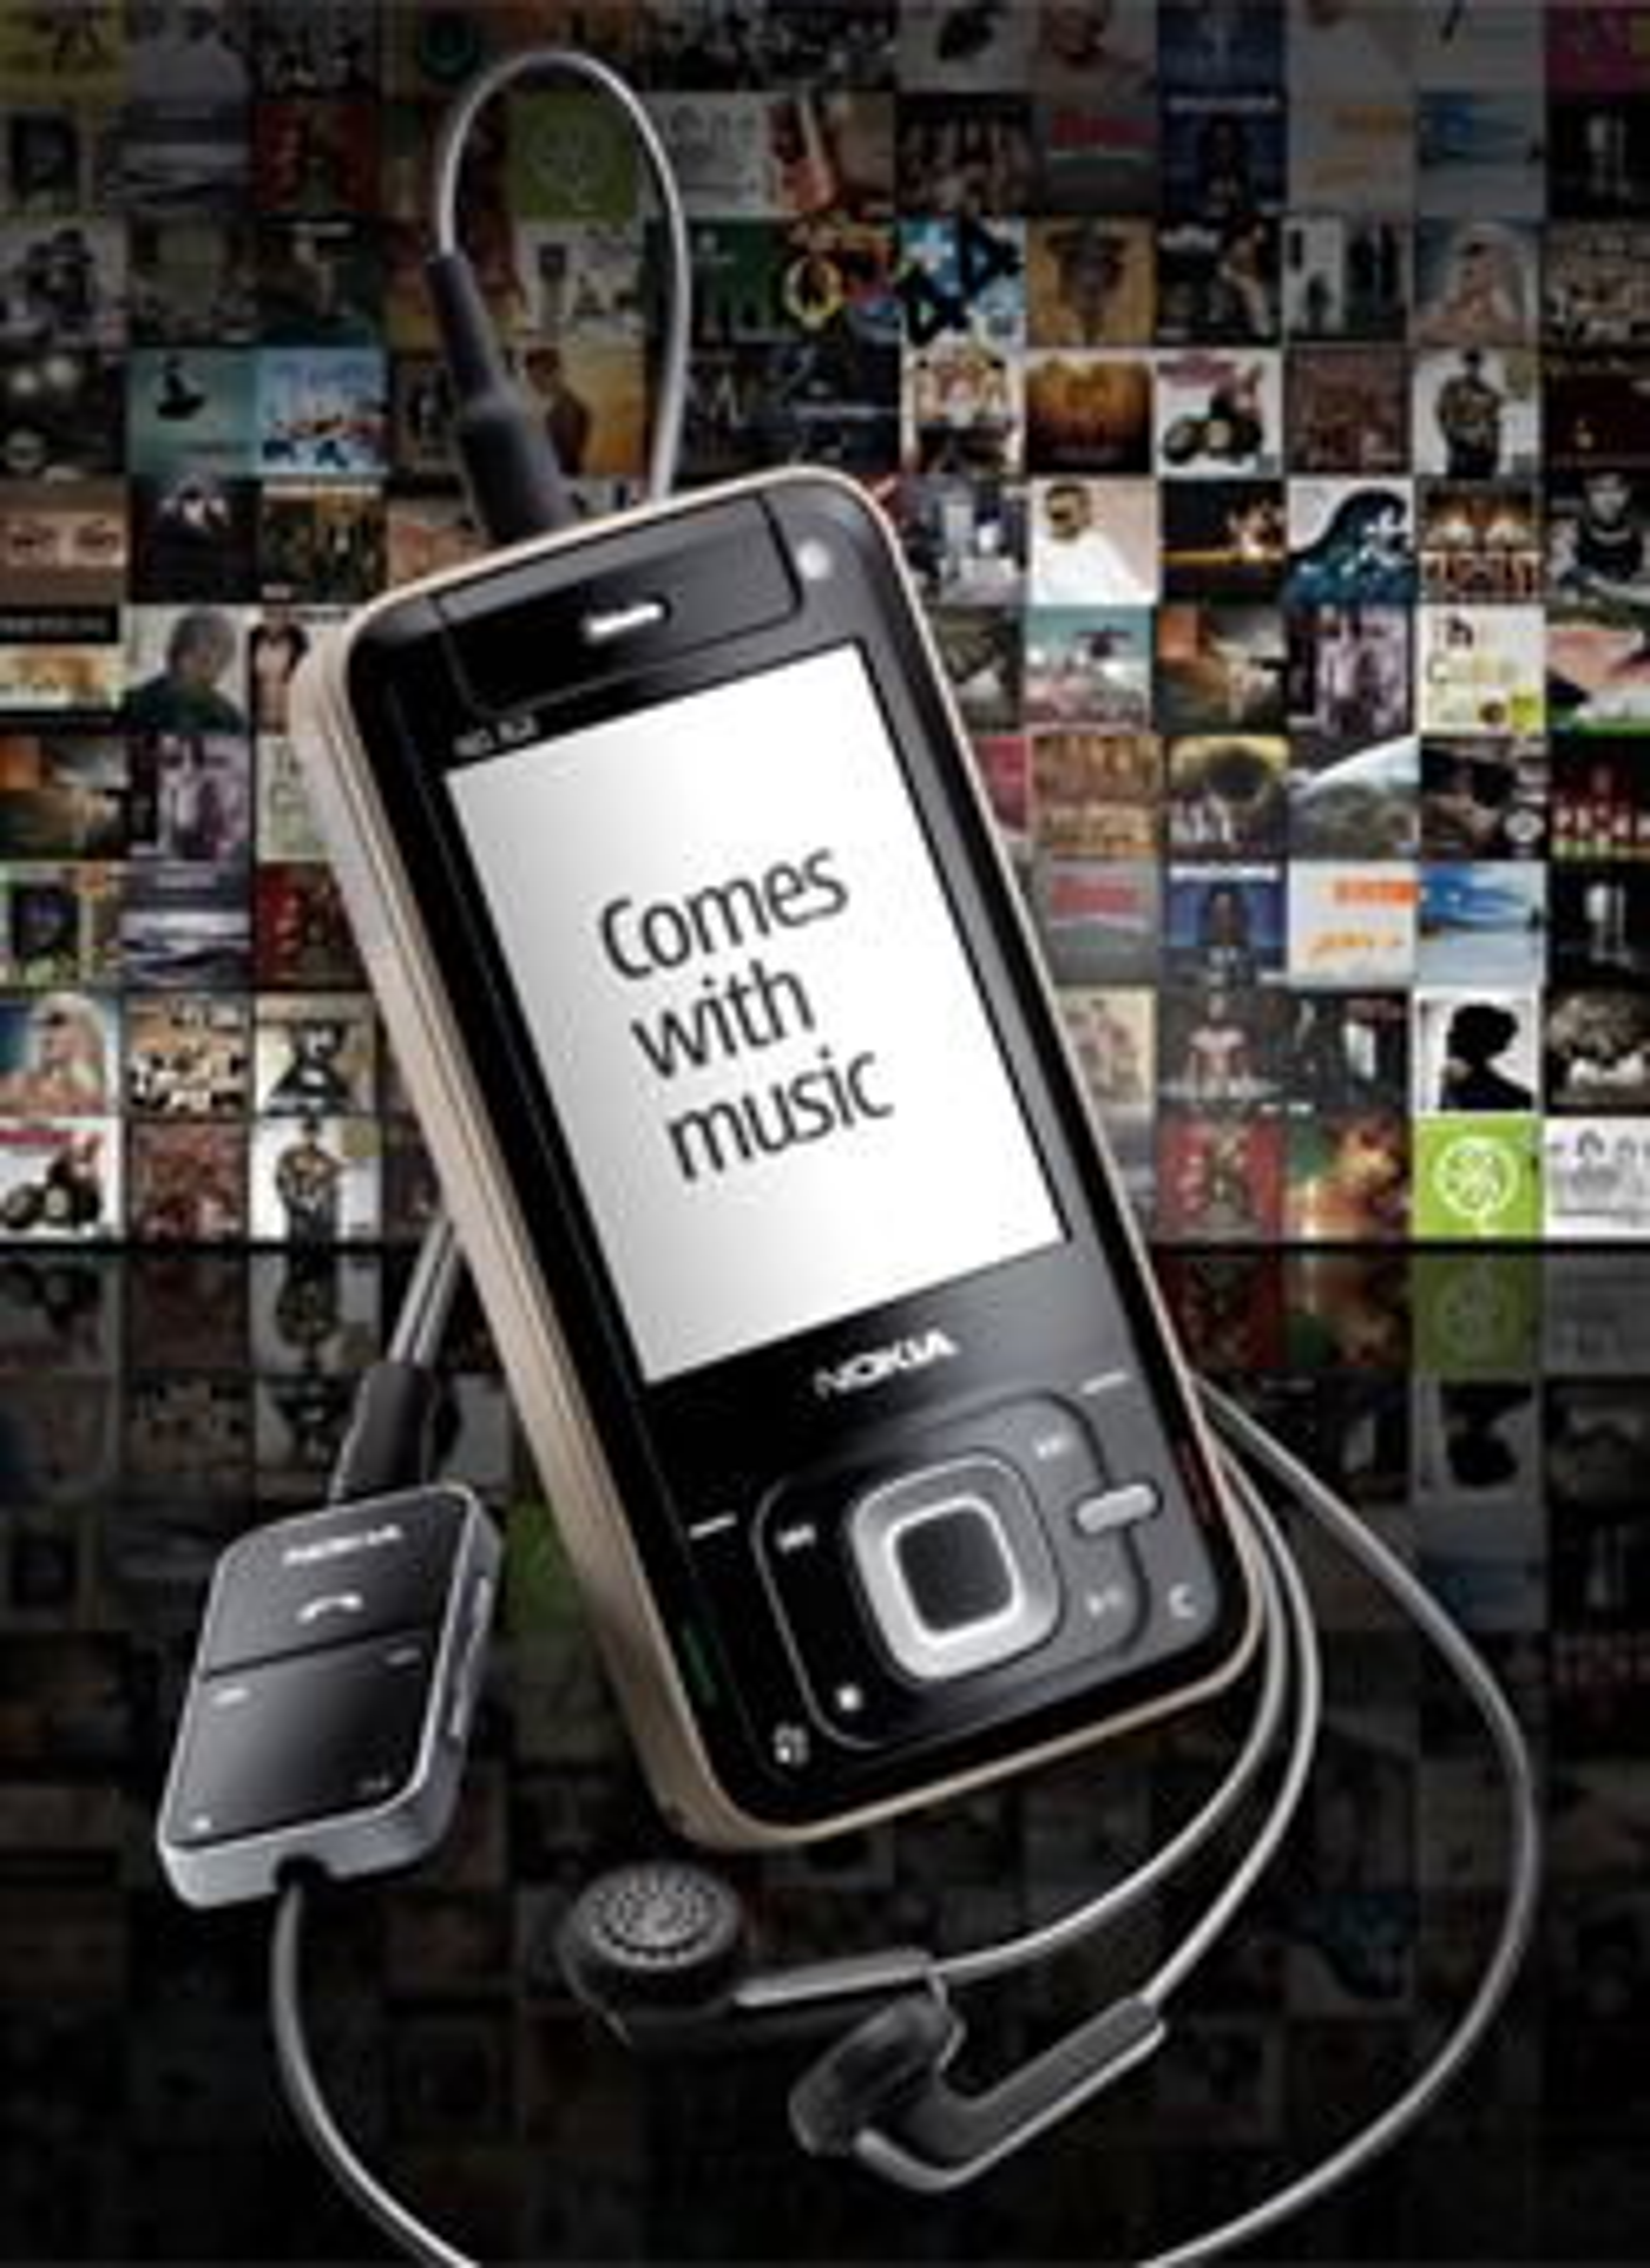 Nå er Sony BMG med på Comes with muci-gildet.